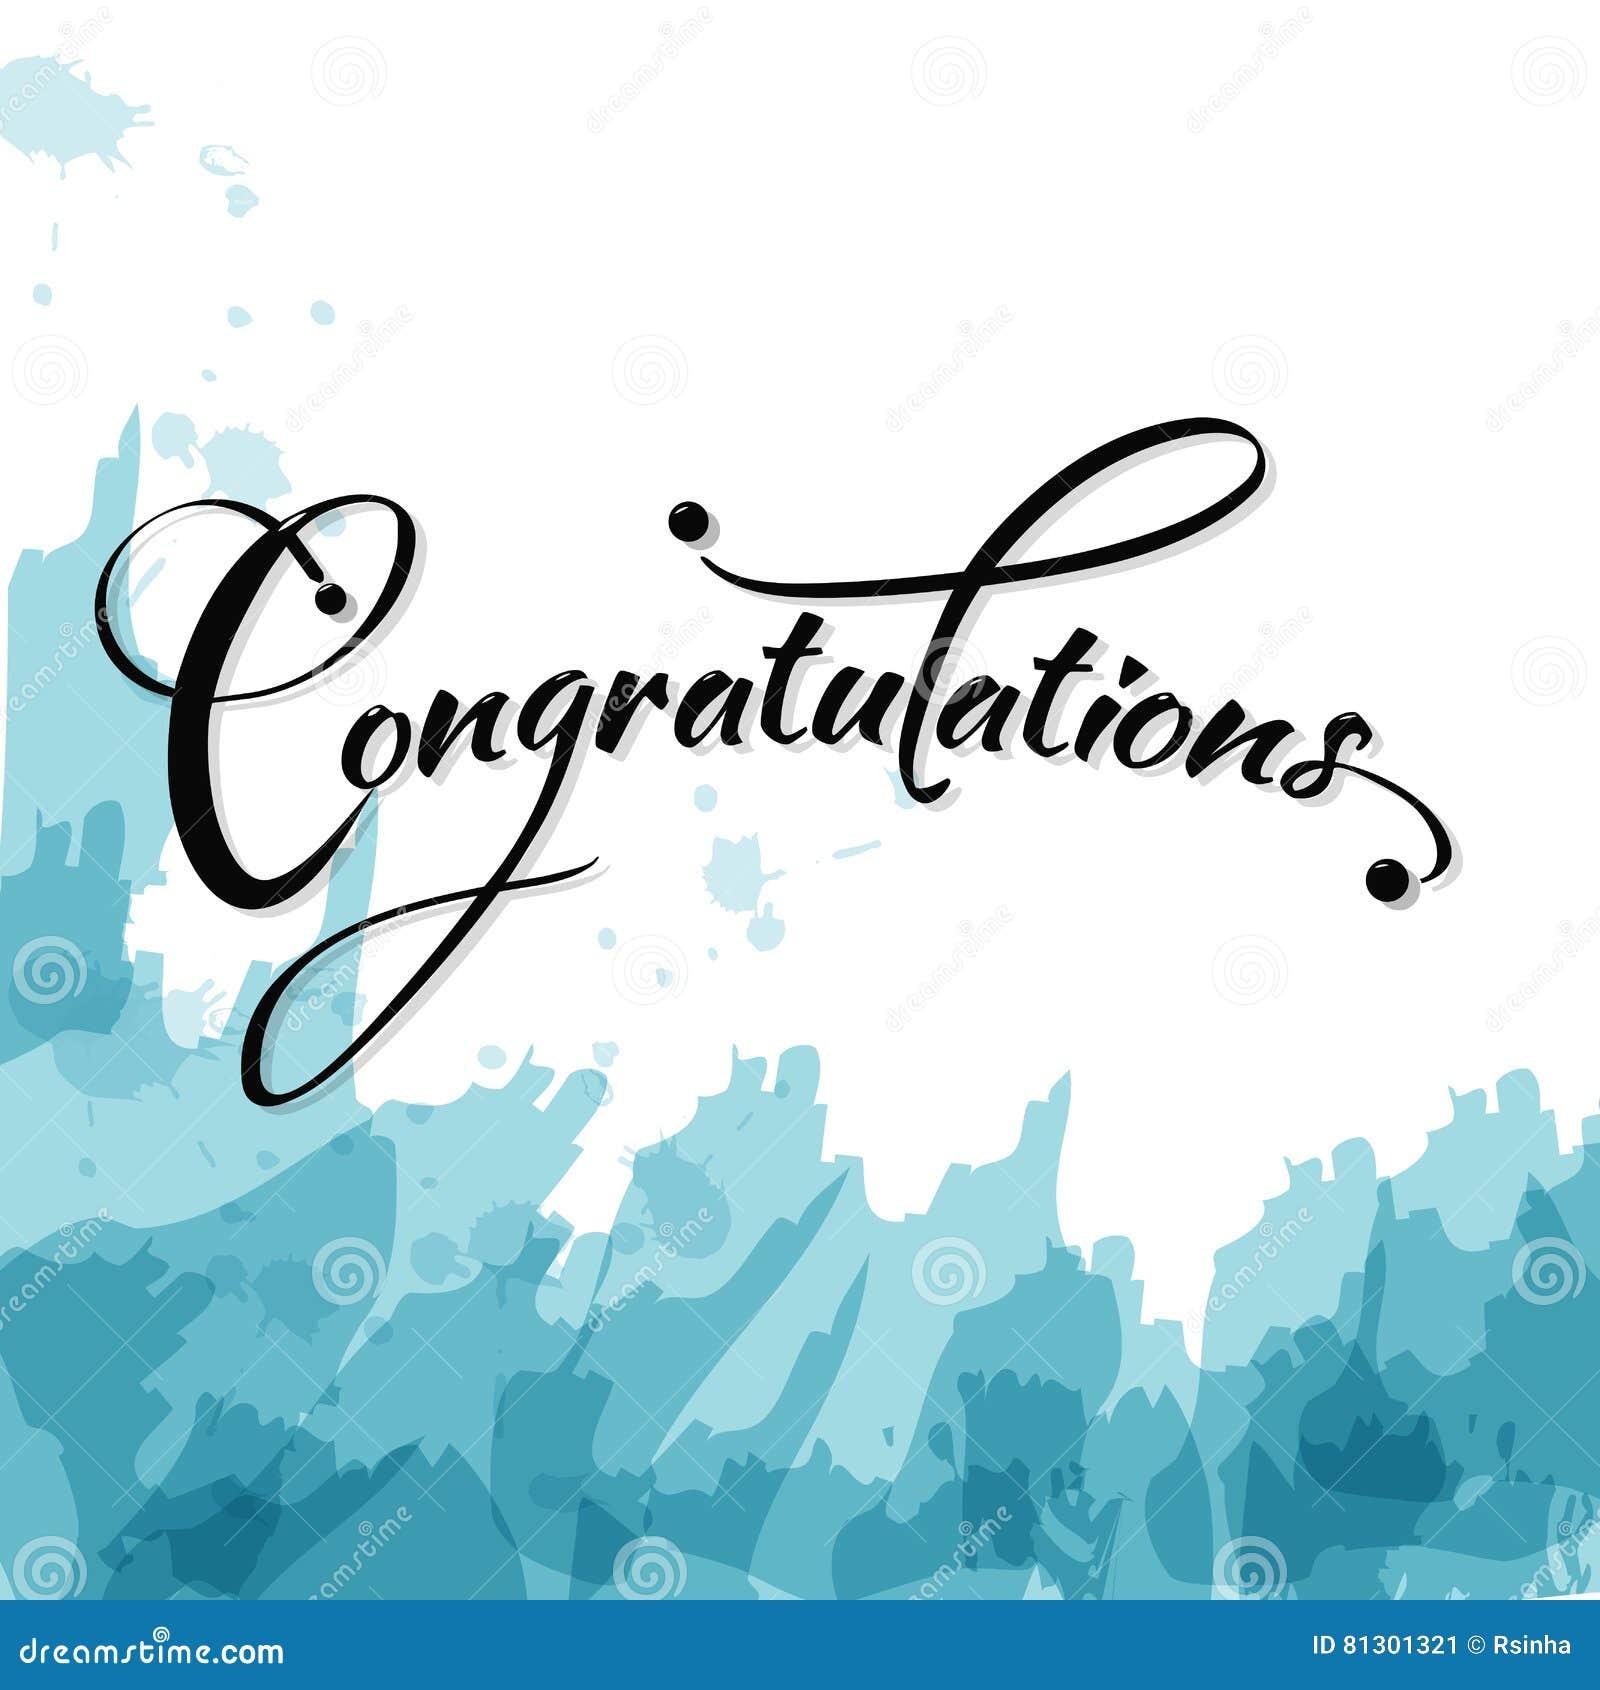 Congratulations calligraphy stock vector image